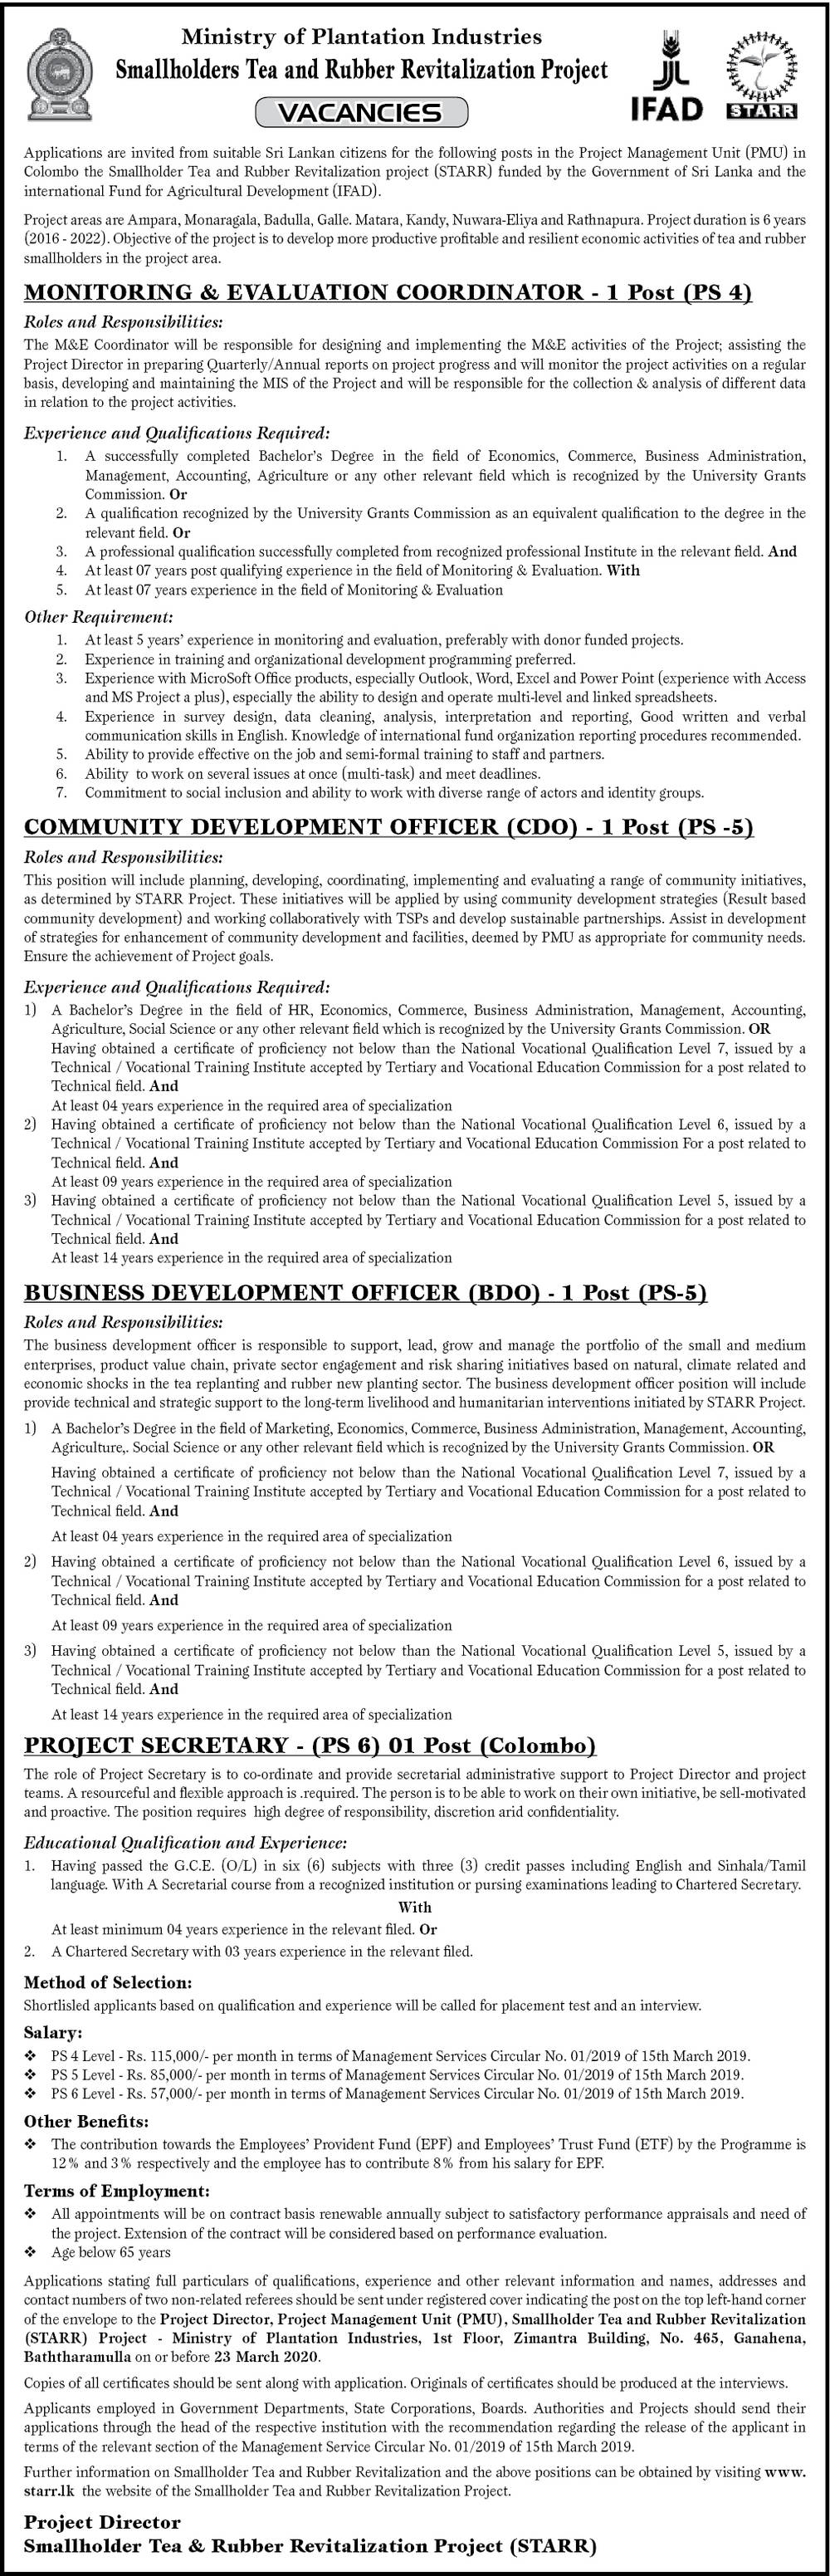 Community Development Officer, Business Development Officer, Project Secretary, Monitoring & Evaluation Coordinator - Ministry of Plantation Industries